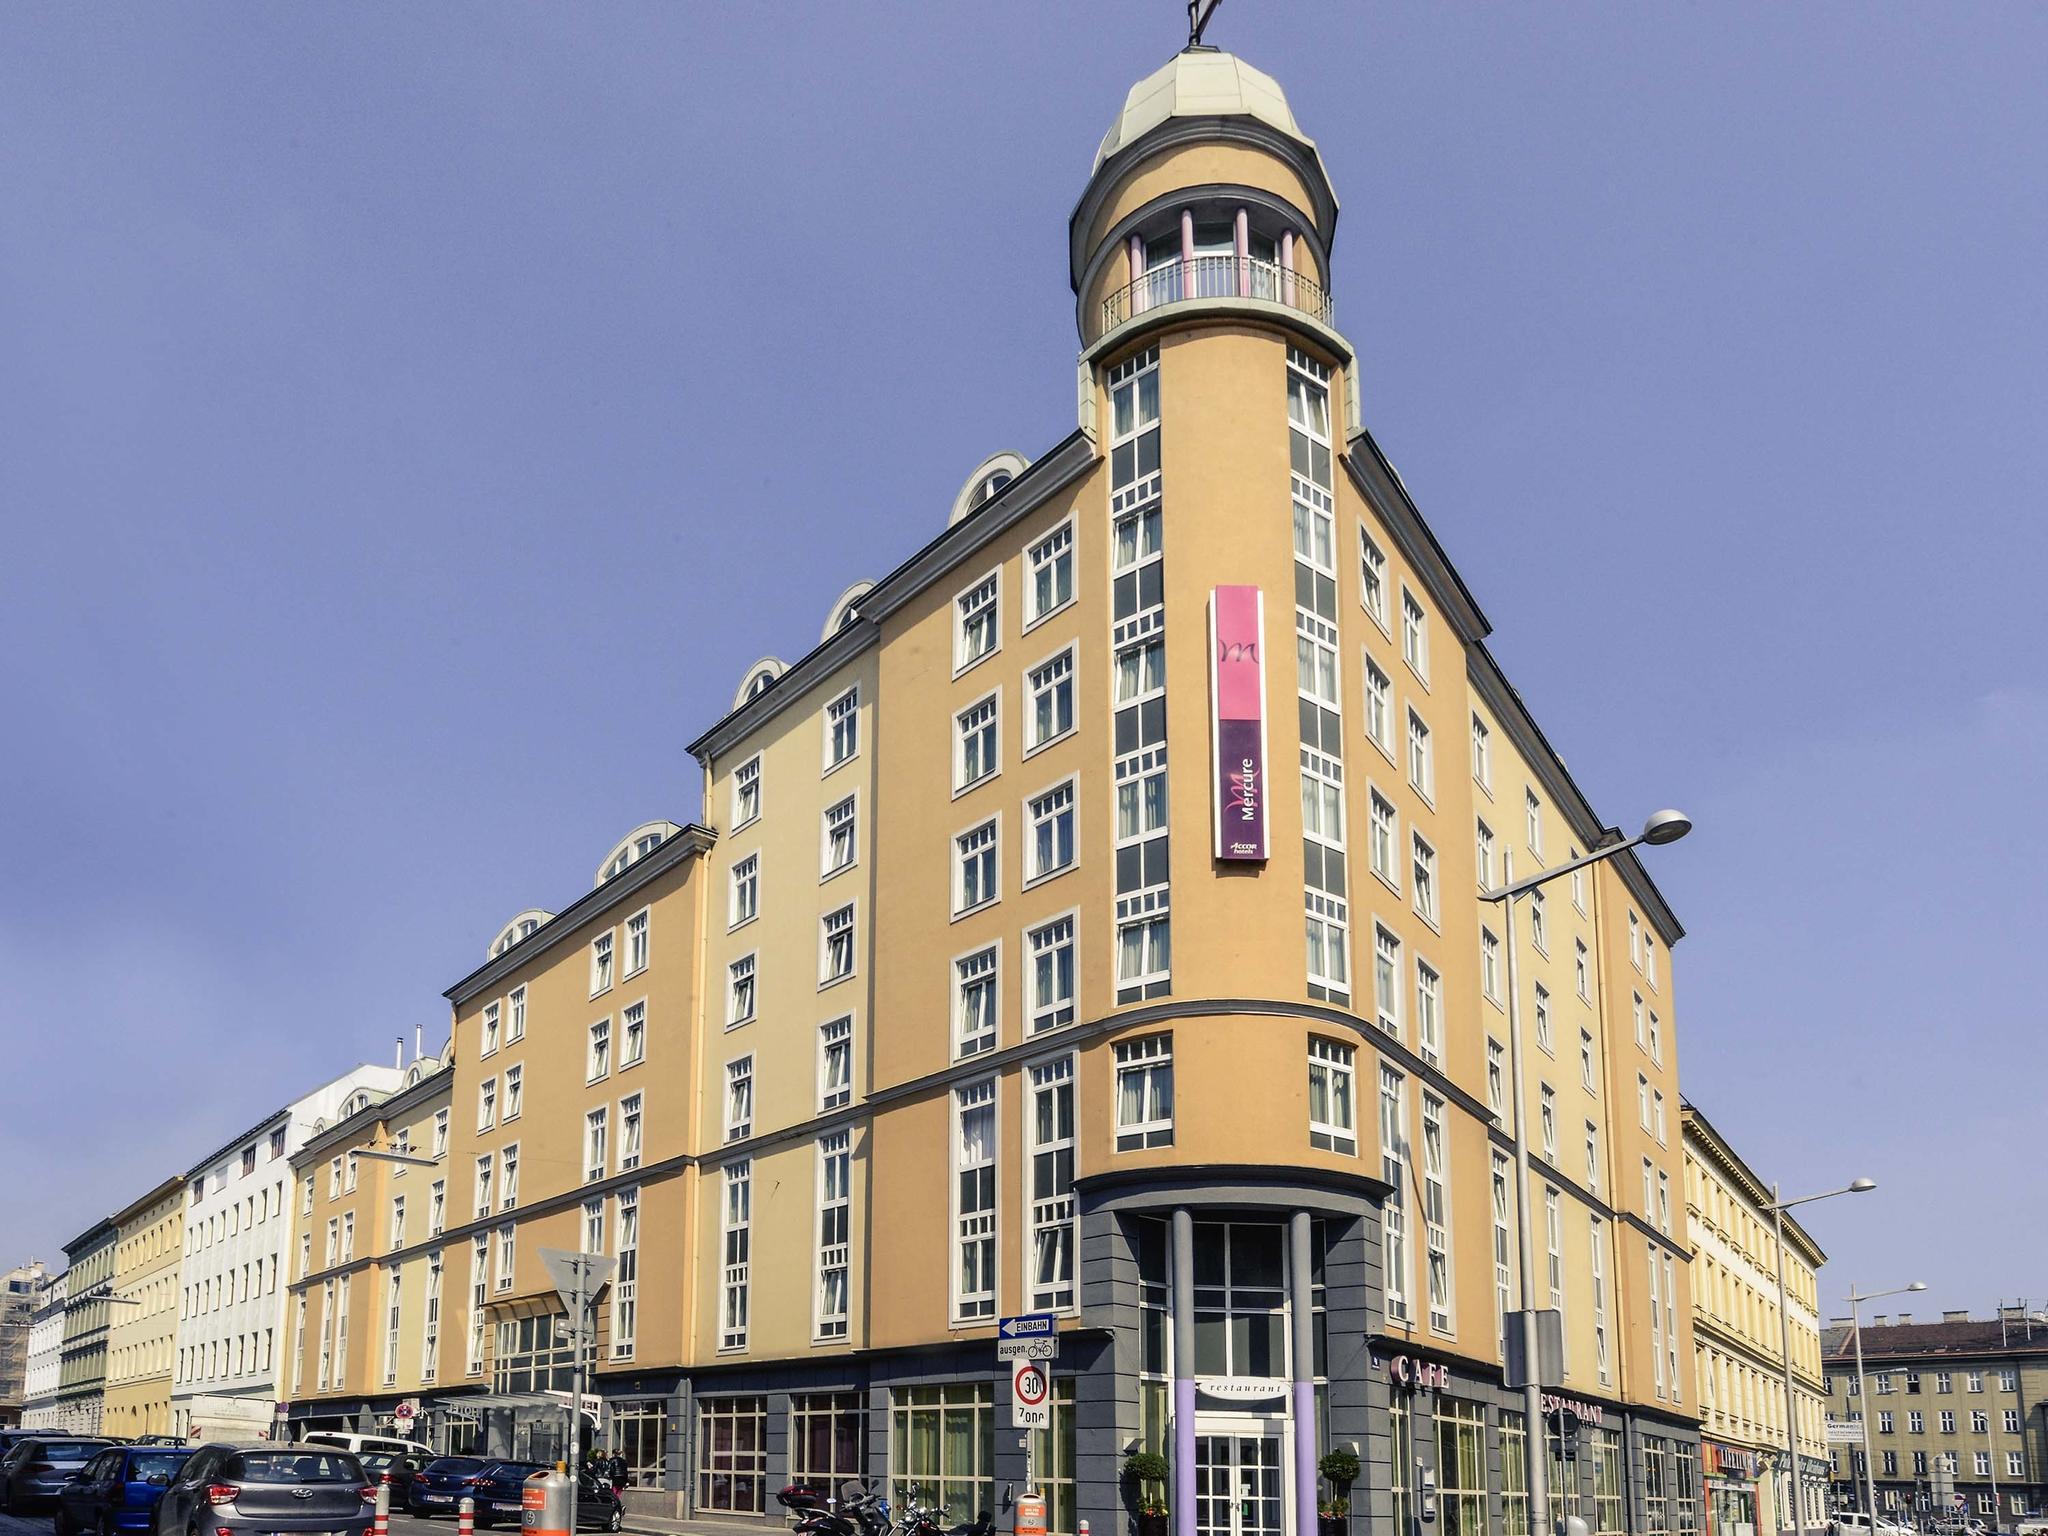 فندق - فندق مركيور Mercure فين وستبانهوف